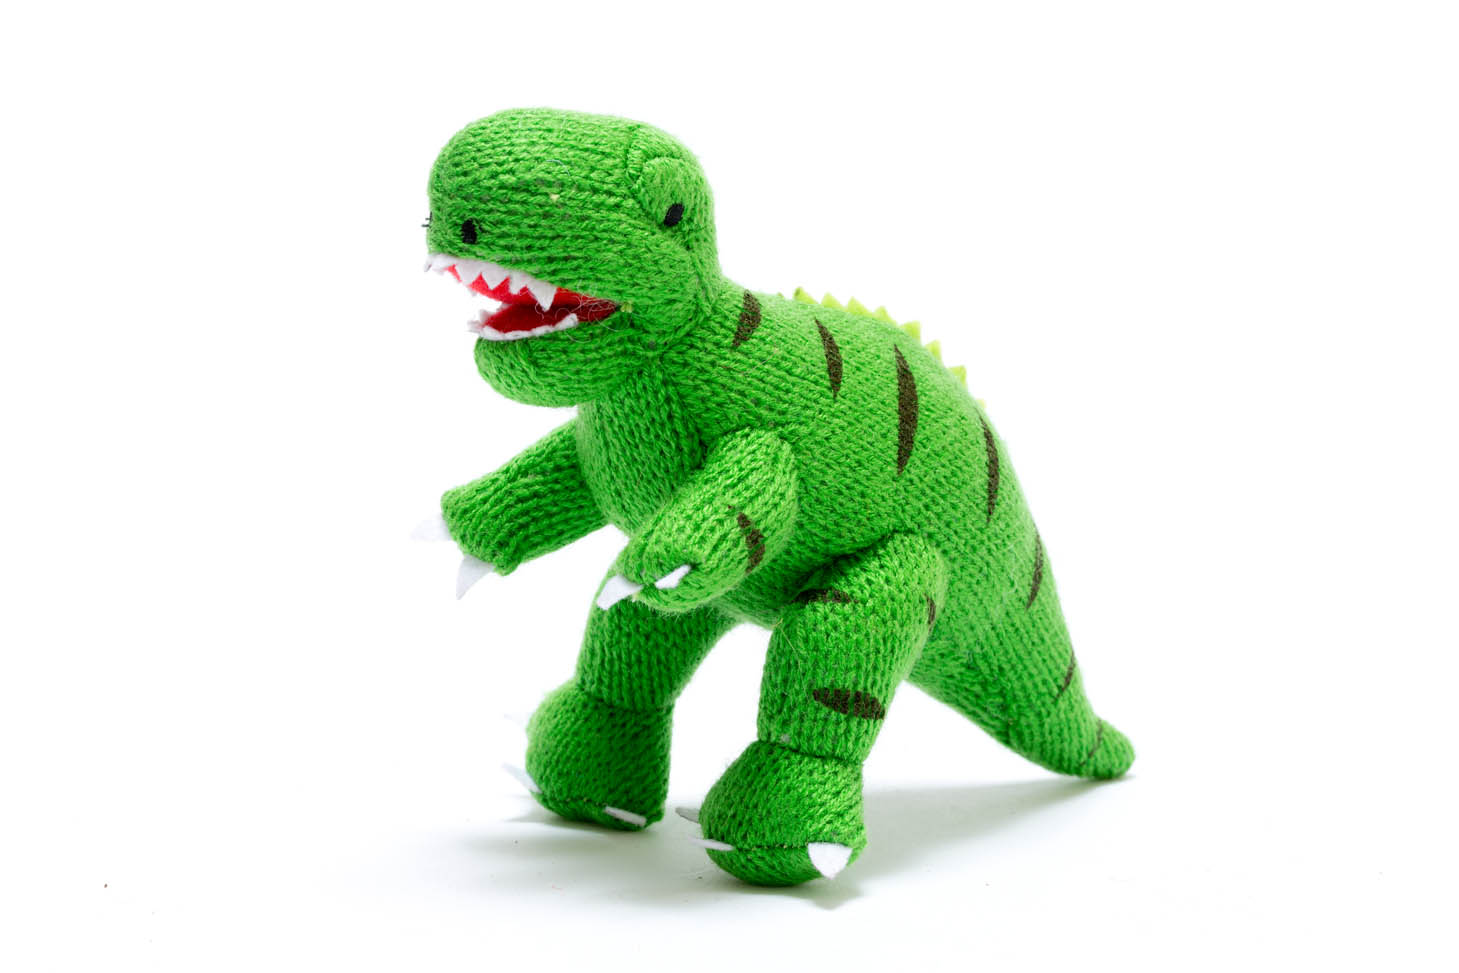 DinoRattle